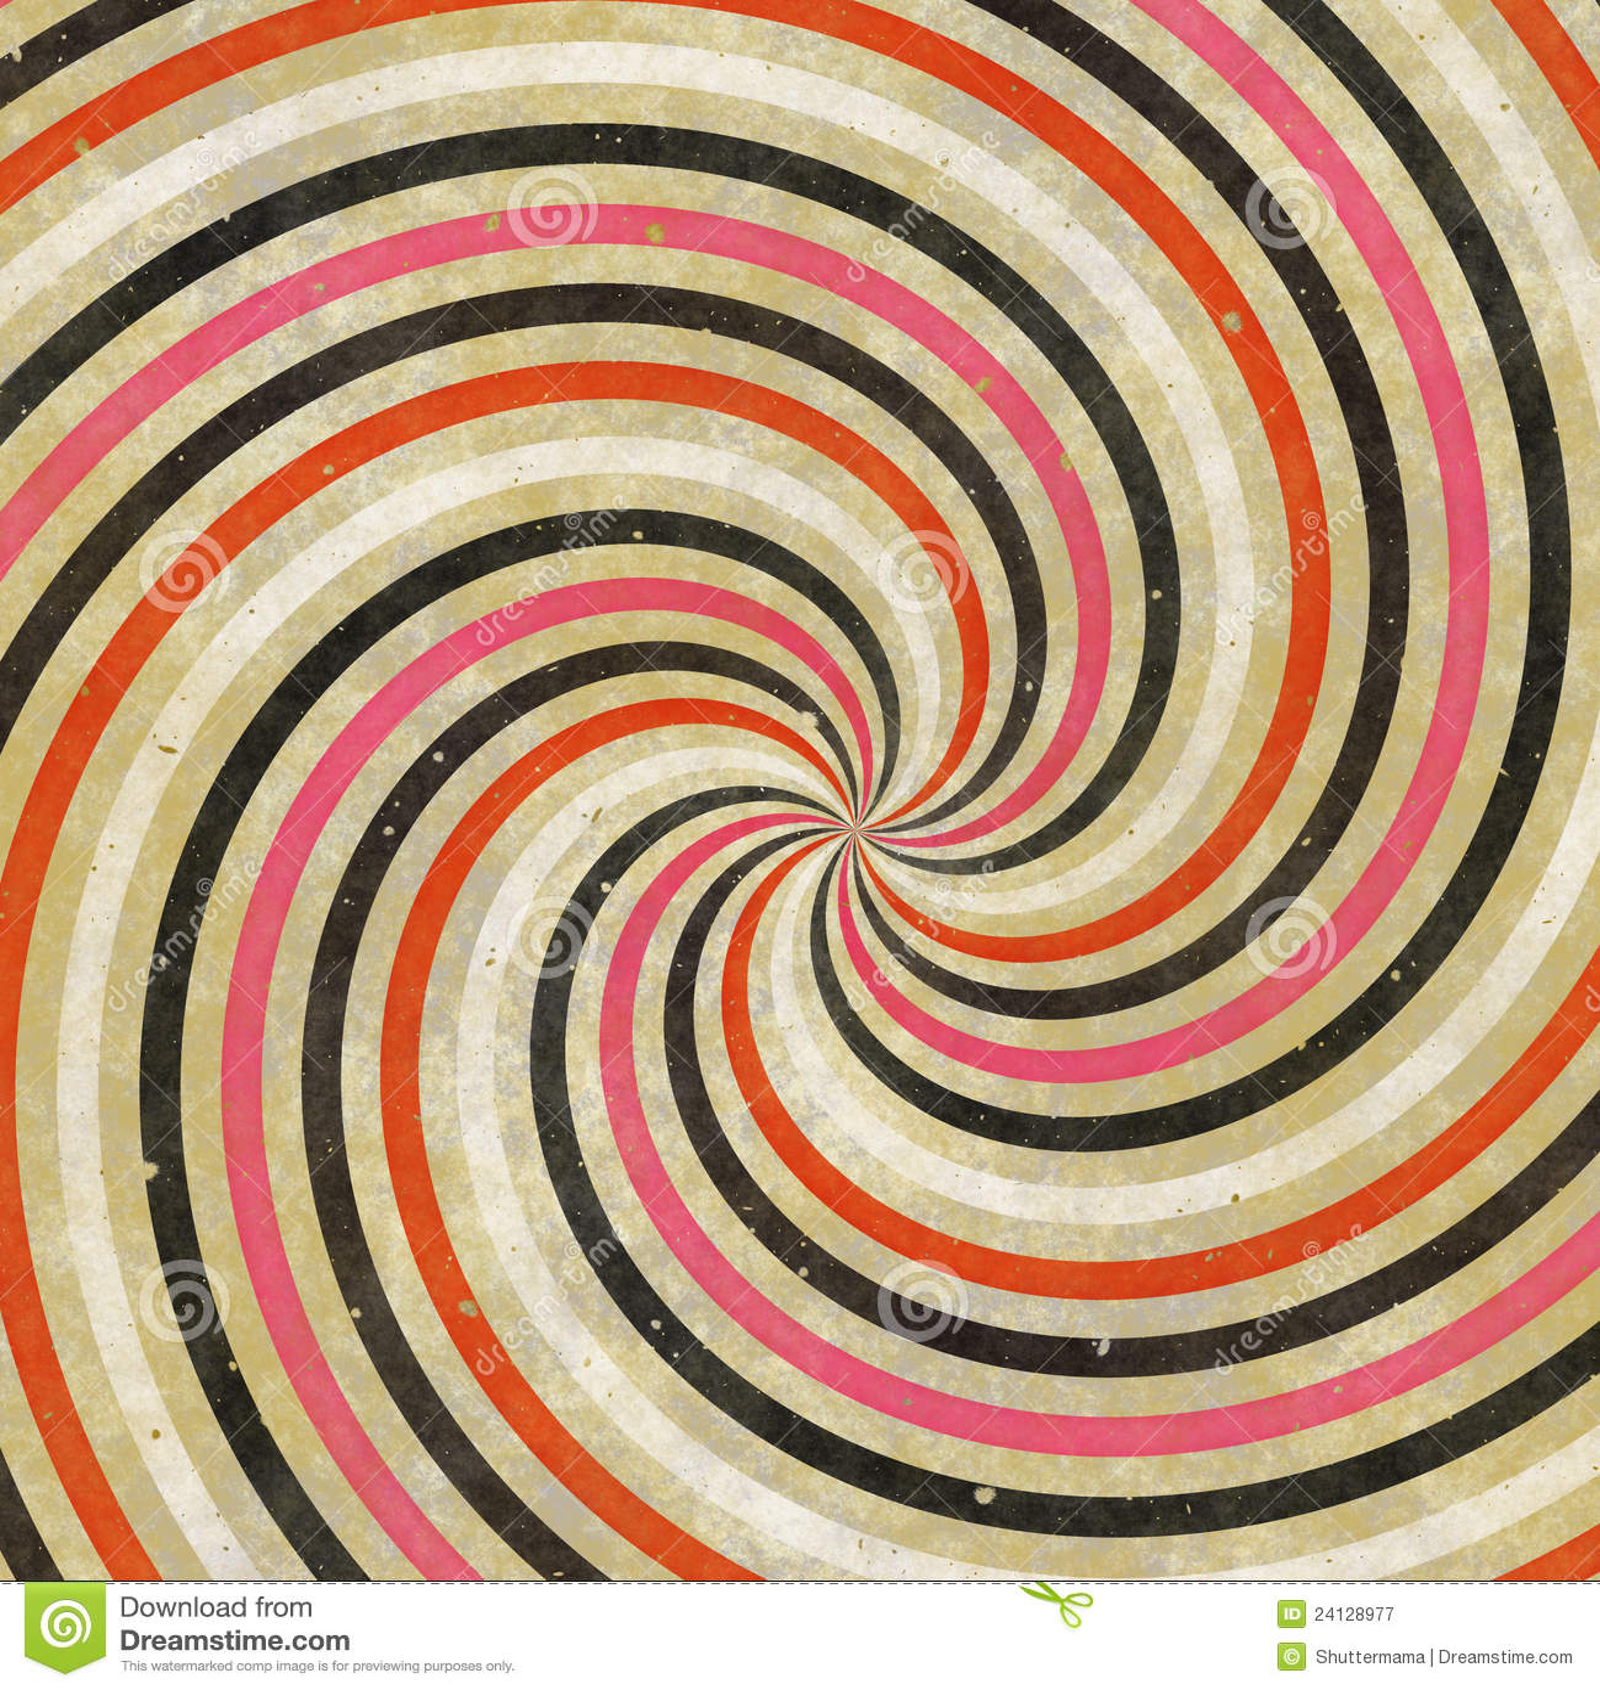 60 S 70 S Retro Swirl Funky Wild Spiral Rays Royalty Free